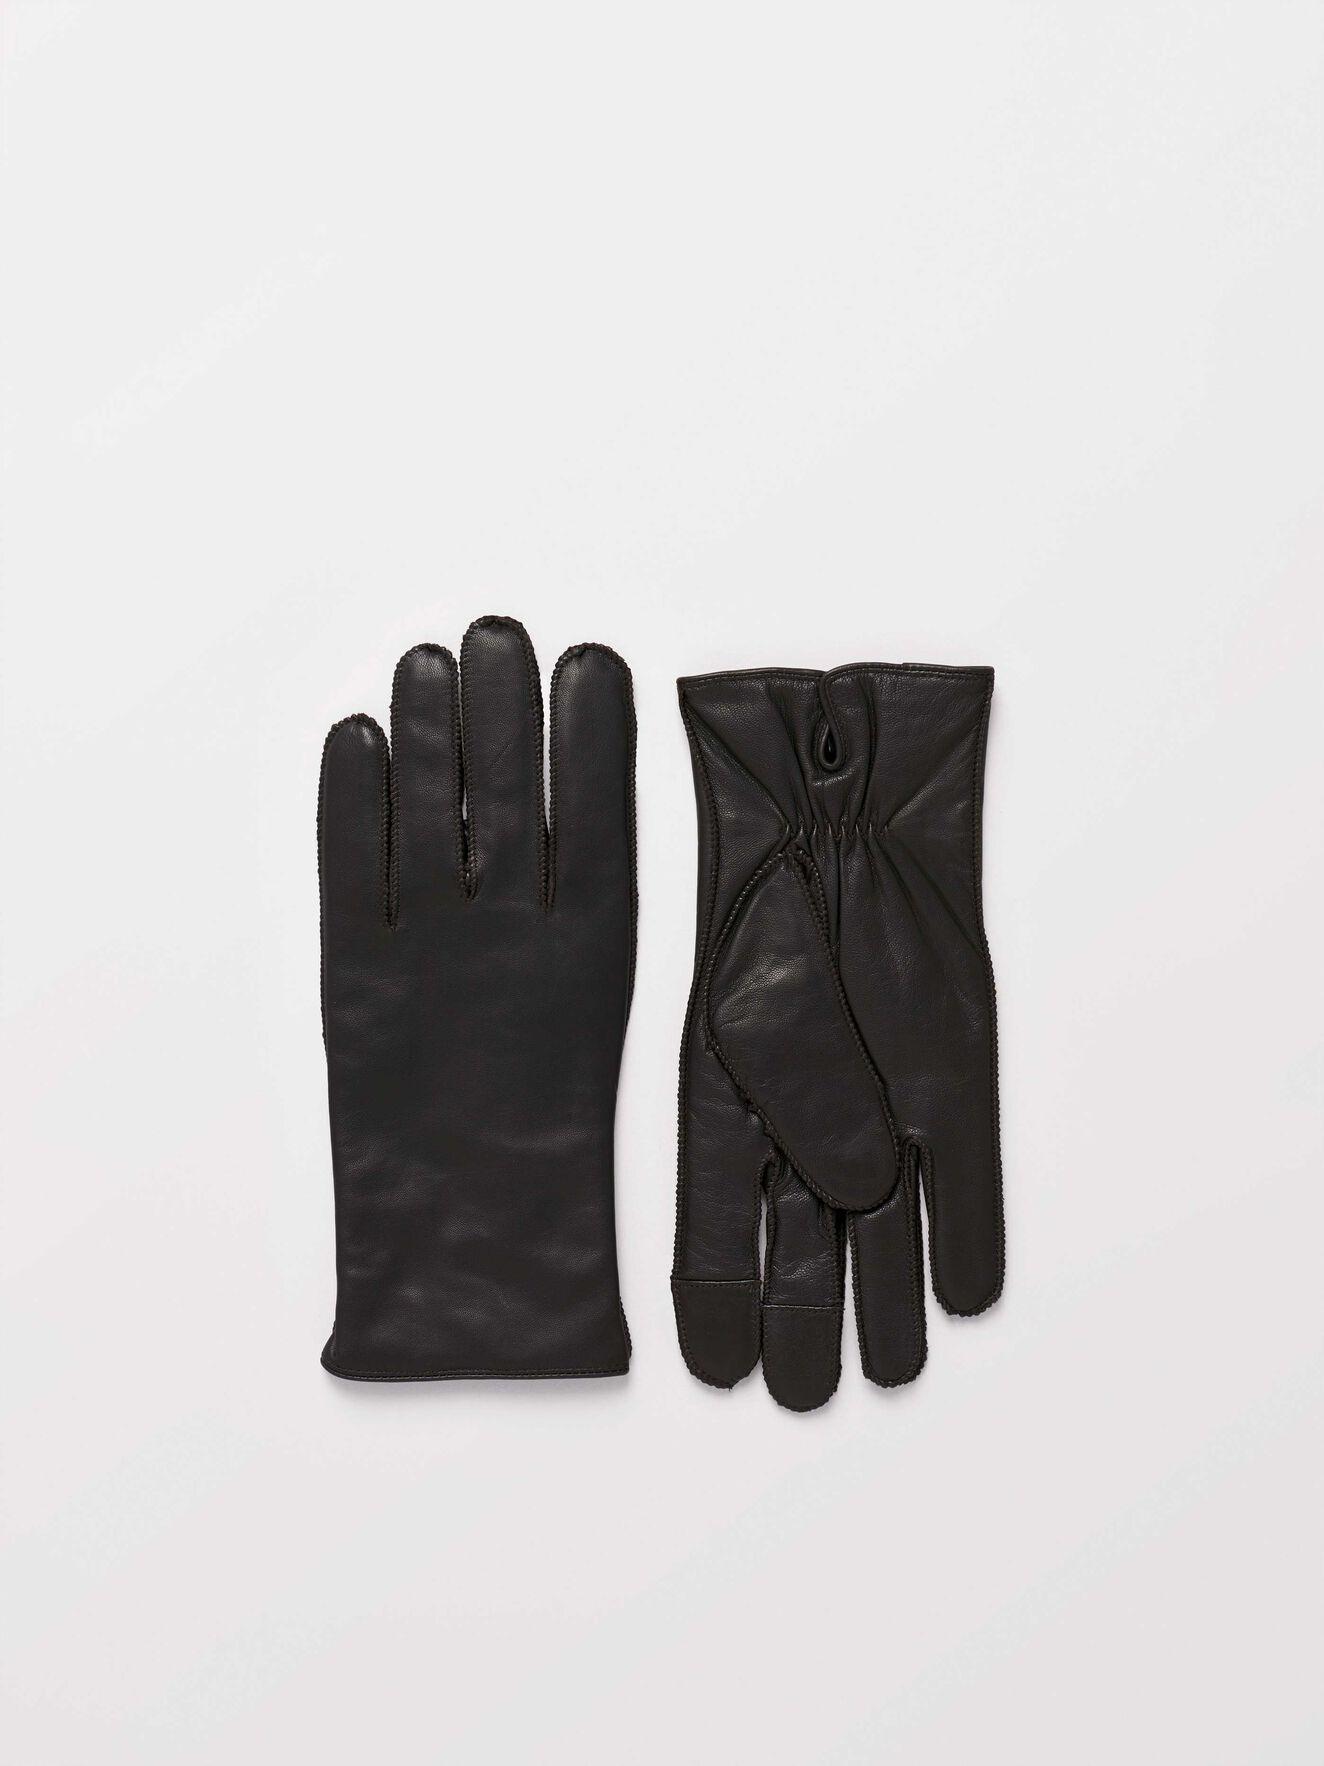 Gandalus Gloves in Dark Brown from Tiger of Sweden